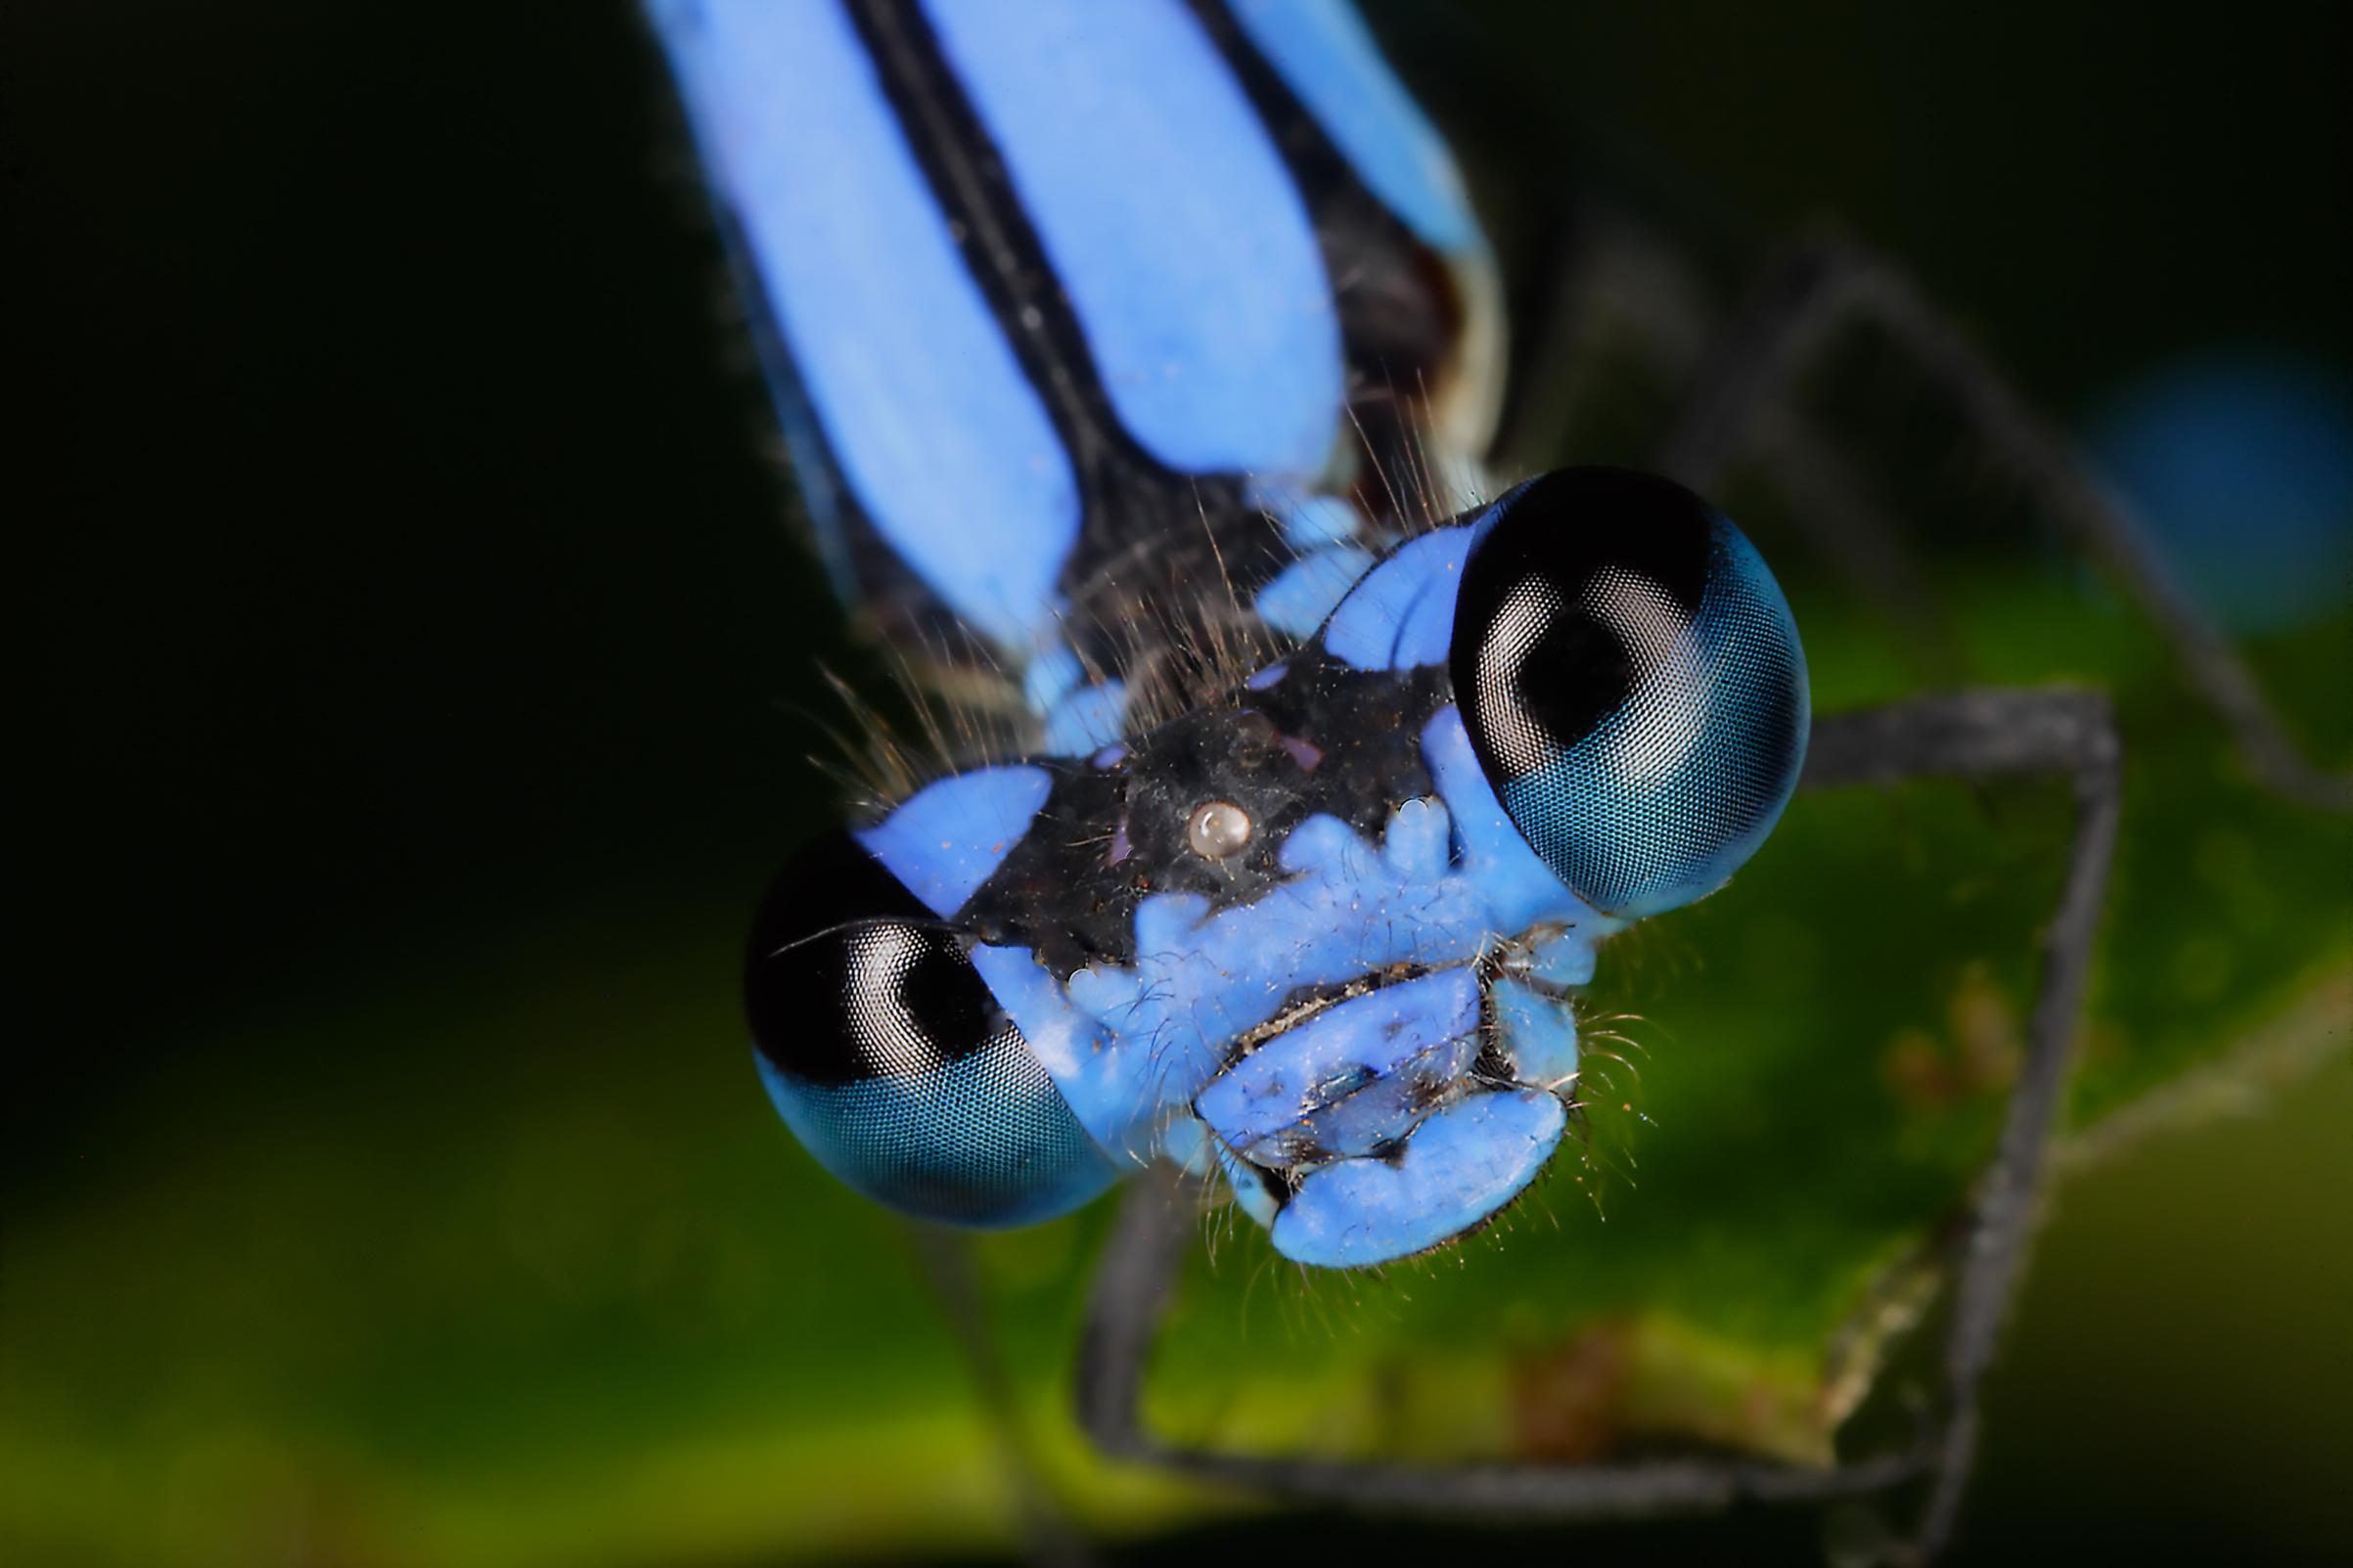 Damselfly, order Odonata, suborder Zygoptera.